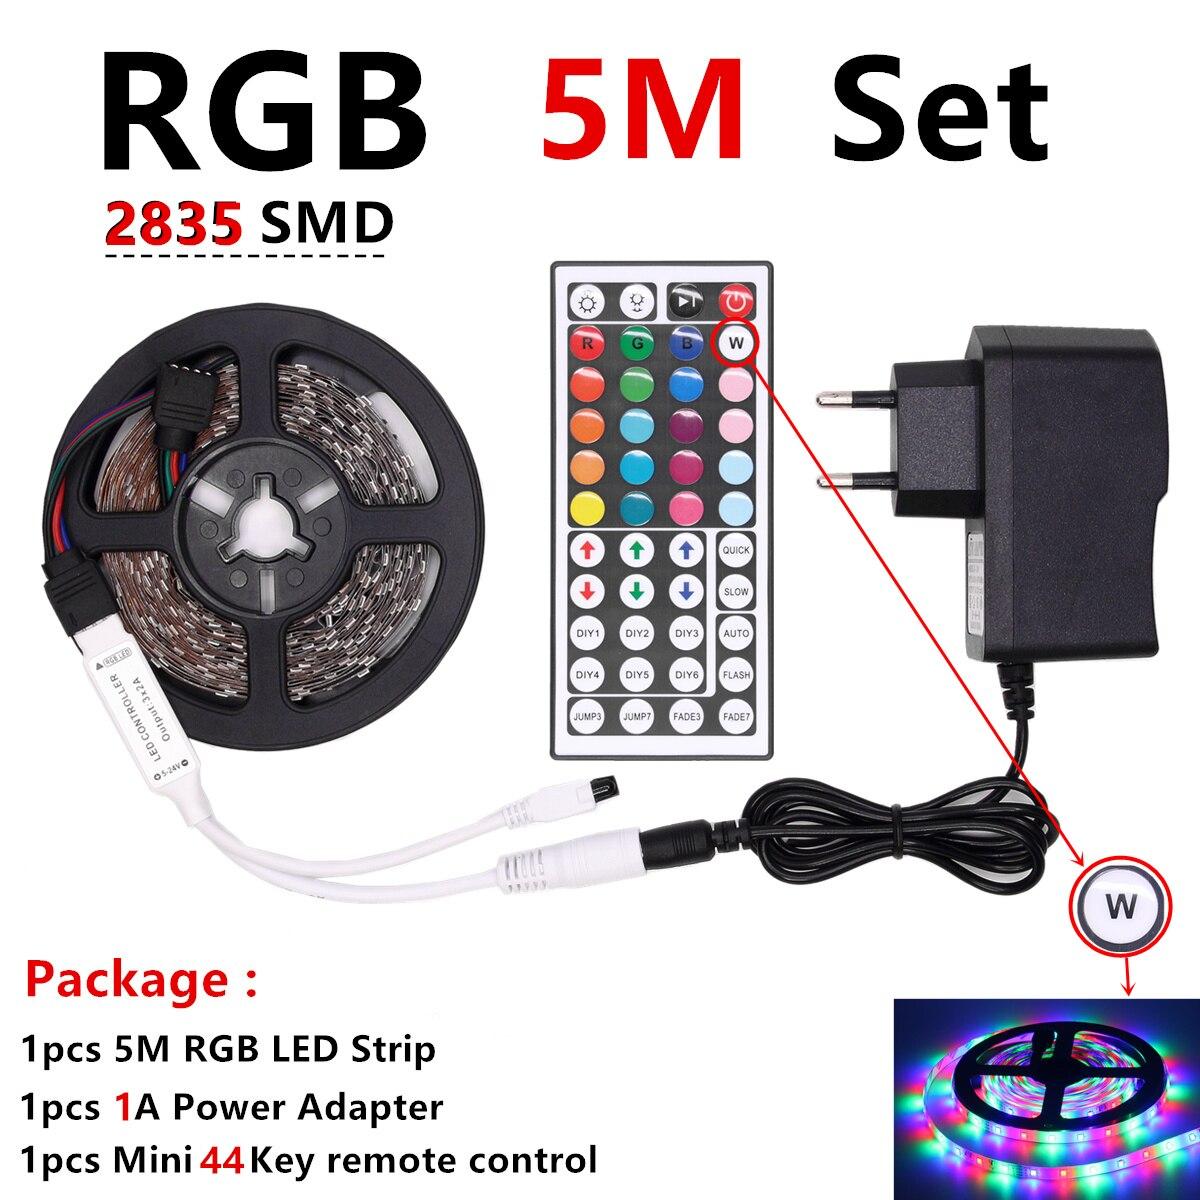 H0b386a0473a943f786c735d49ed9b889c RGB LED Strip Light RGB 5050 SMD 2835 Flexible Ribbon fita led light strip RGB 5M 10M Tape Diode DC 12V Remote Control Adapter